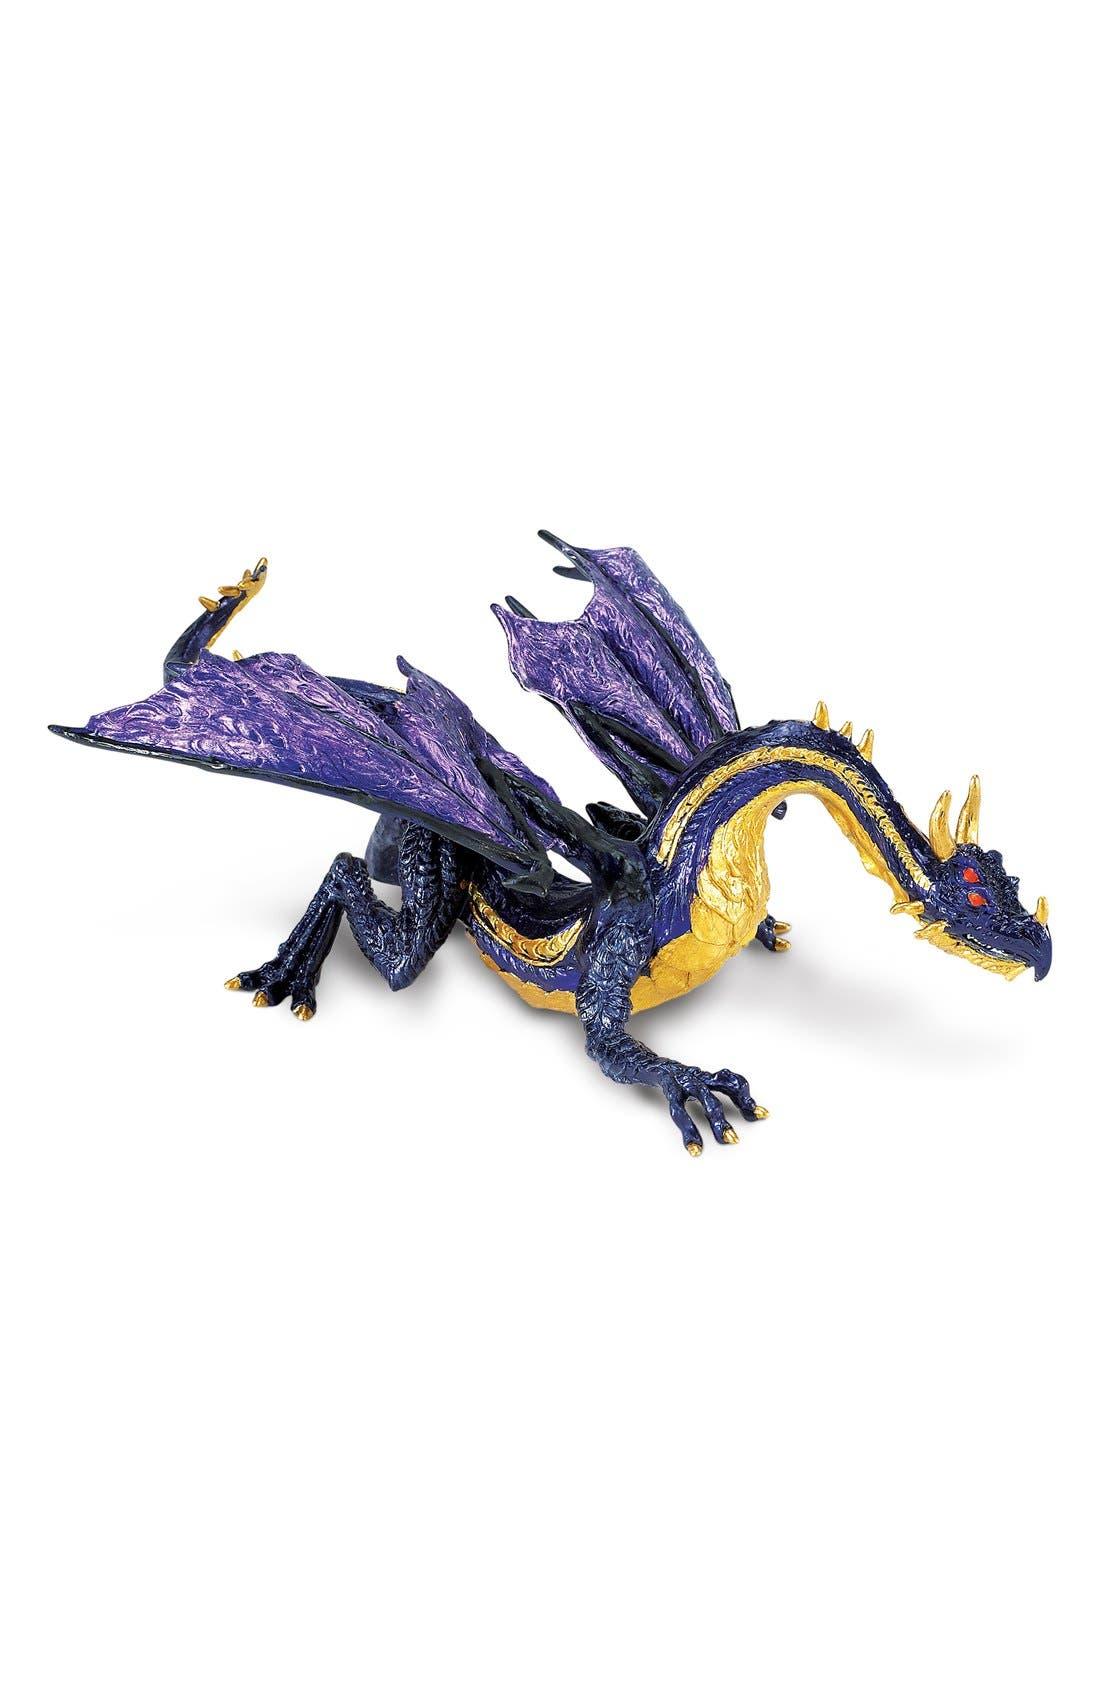 SAFARI LTD. Midnight Moon Dragon Figurine, Main, color, 999